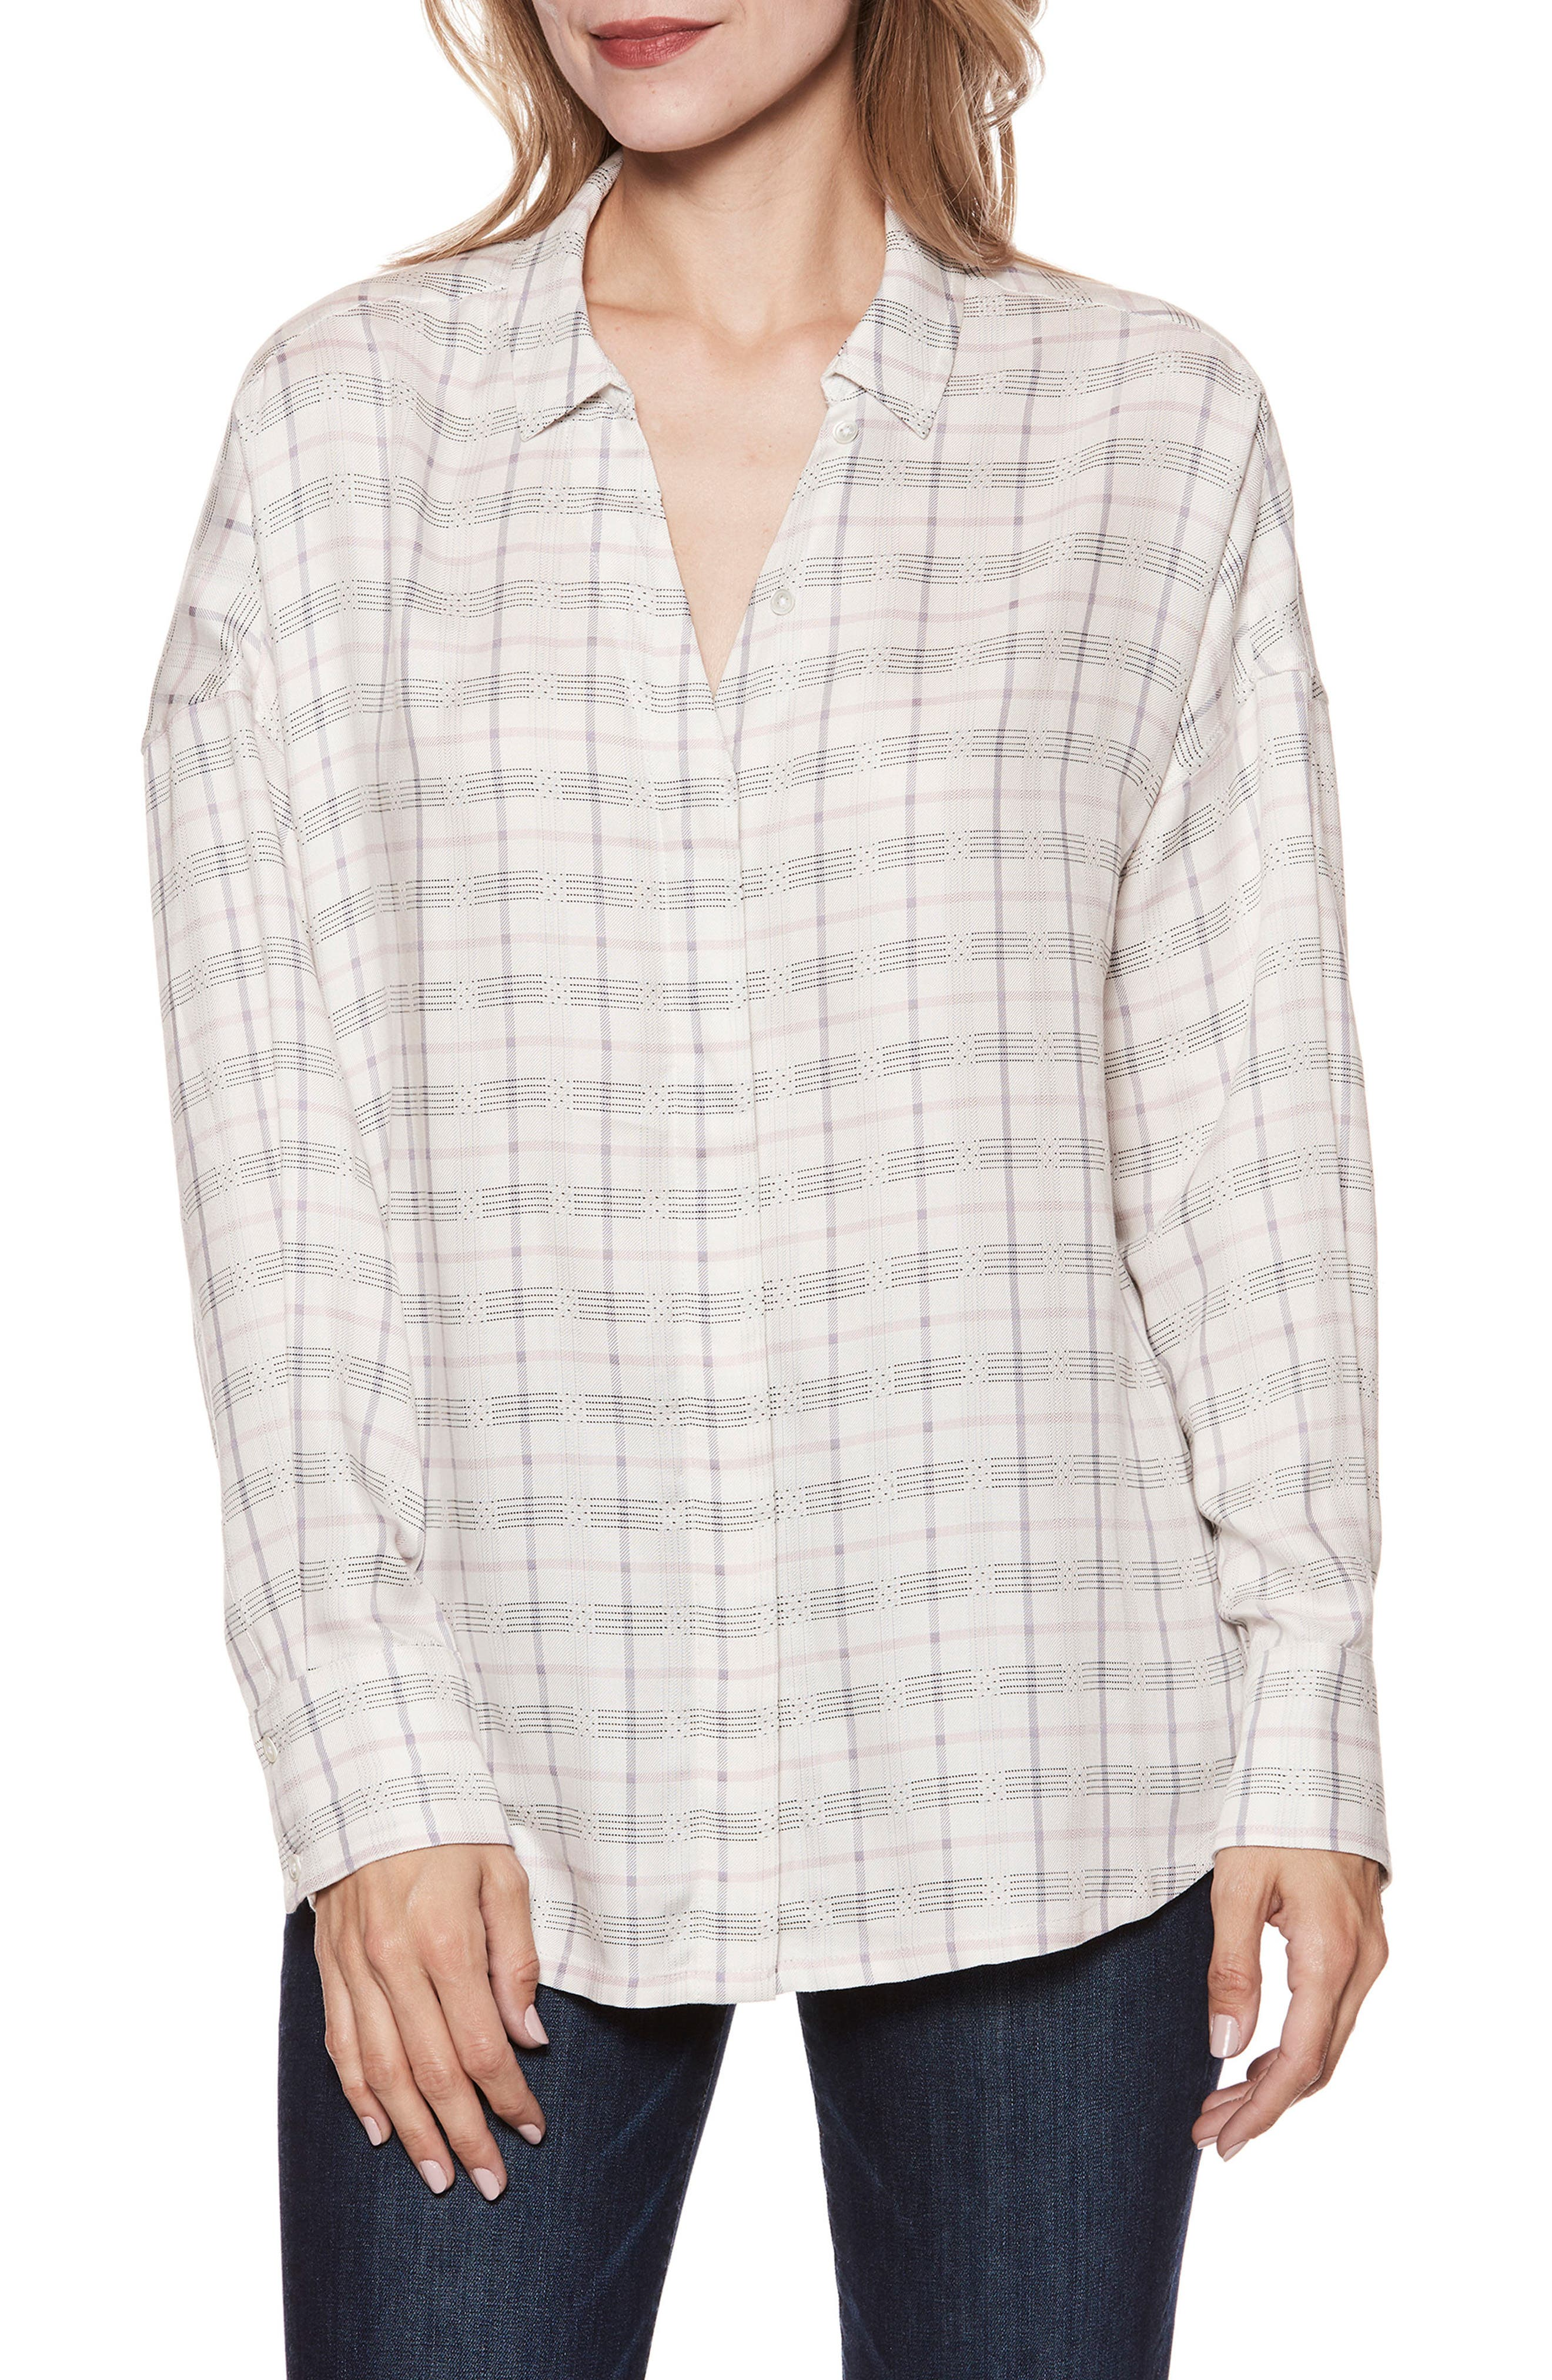 Delisa Check Shirt,                         Main,                         color, White/ Lilac